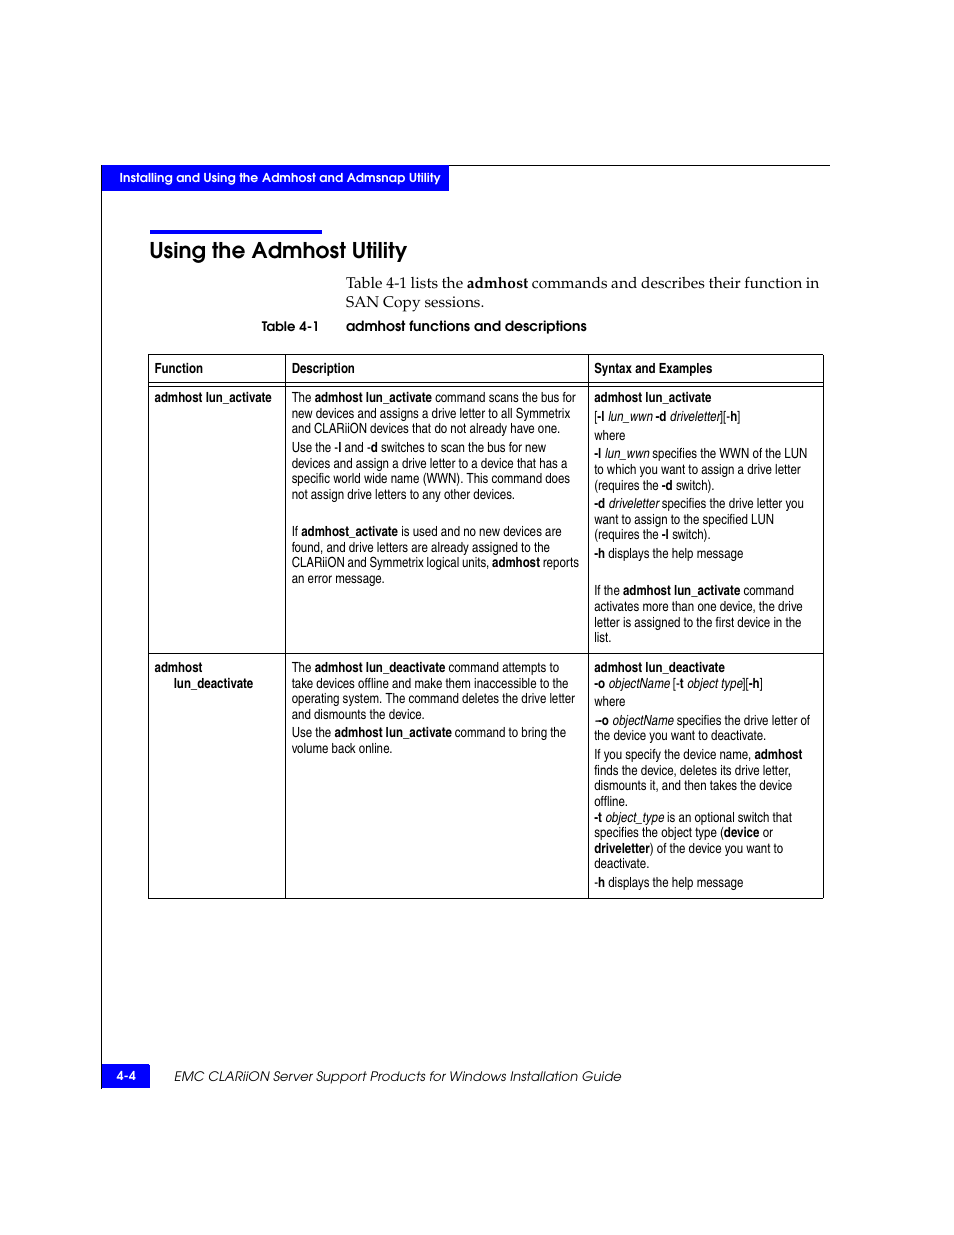 Using the admhost utility, Using the admhost utility -4   EMC CLARiiON User  Manual   Page 46 / 102